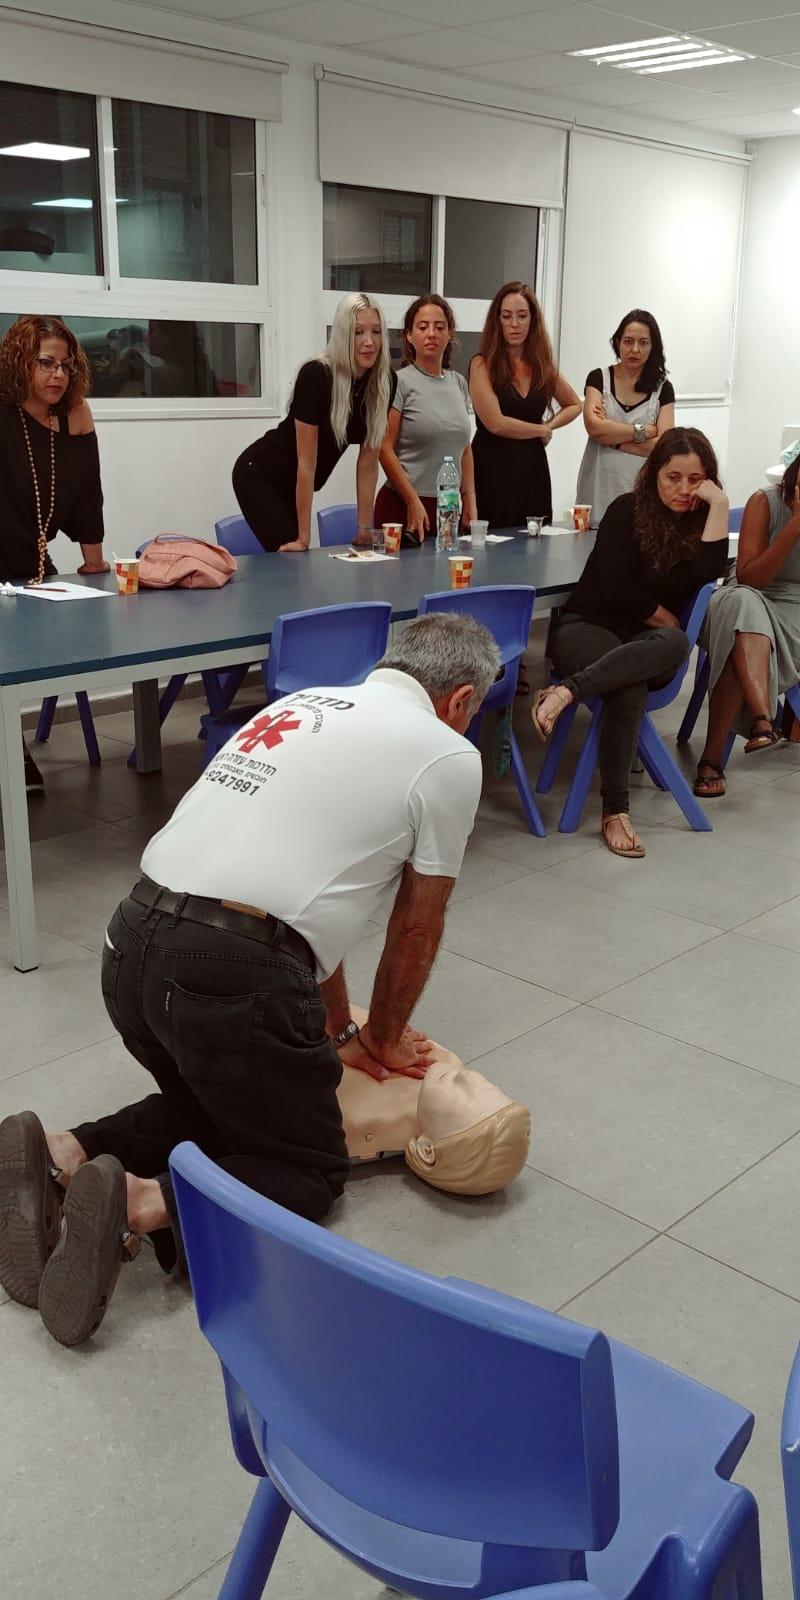 Photo of קורס החייאה ועזרה ראשונה לילדים ותינוקות ללא עלות בראשון לציון